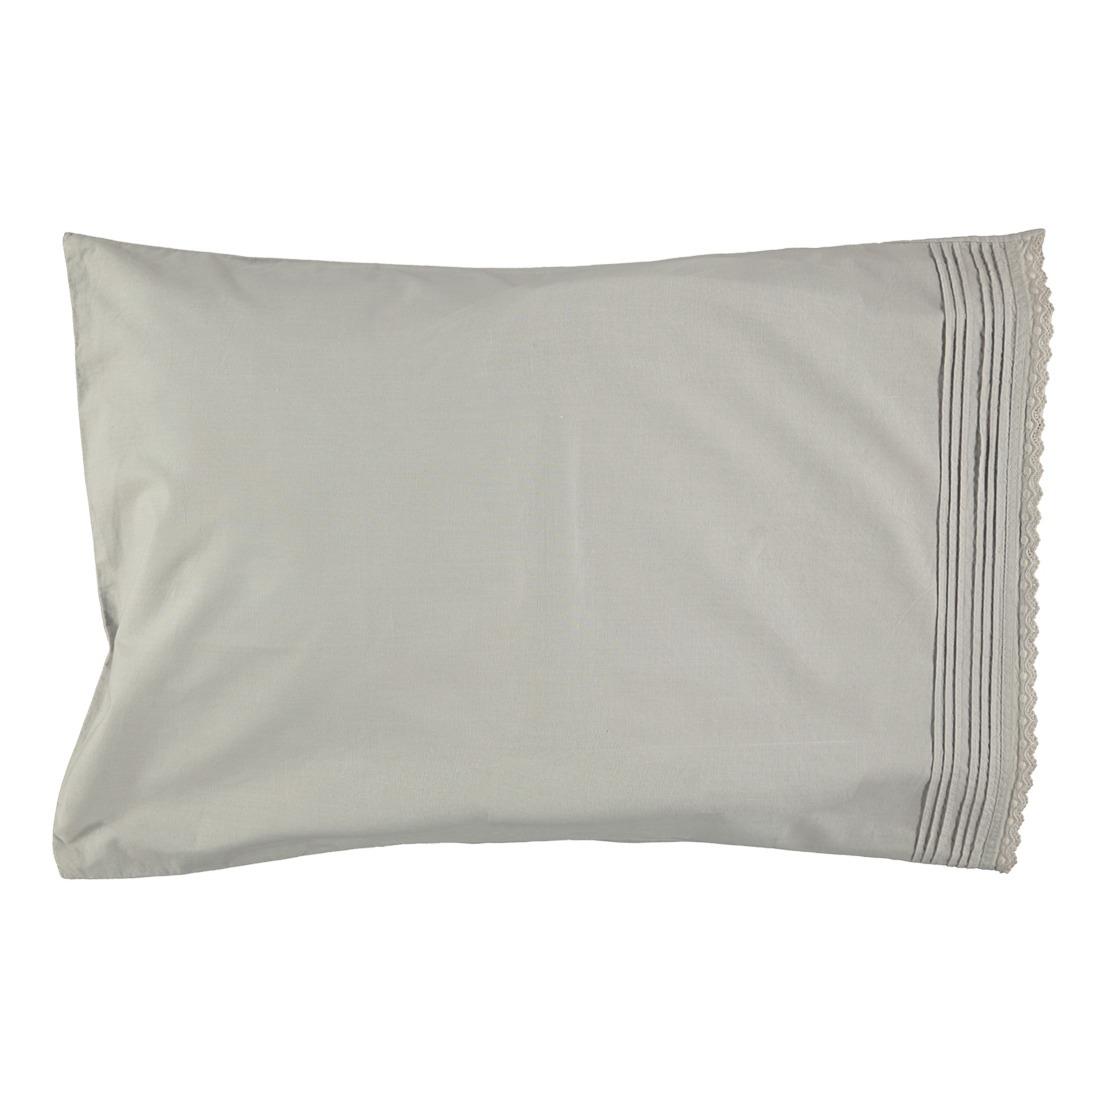 Cotton Poplin Pillow Case Grey Camomile